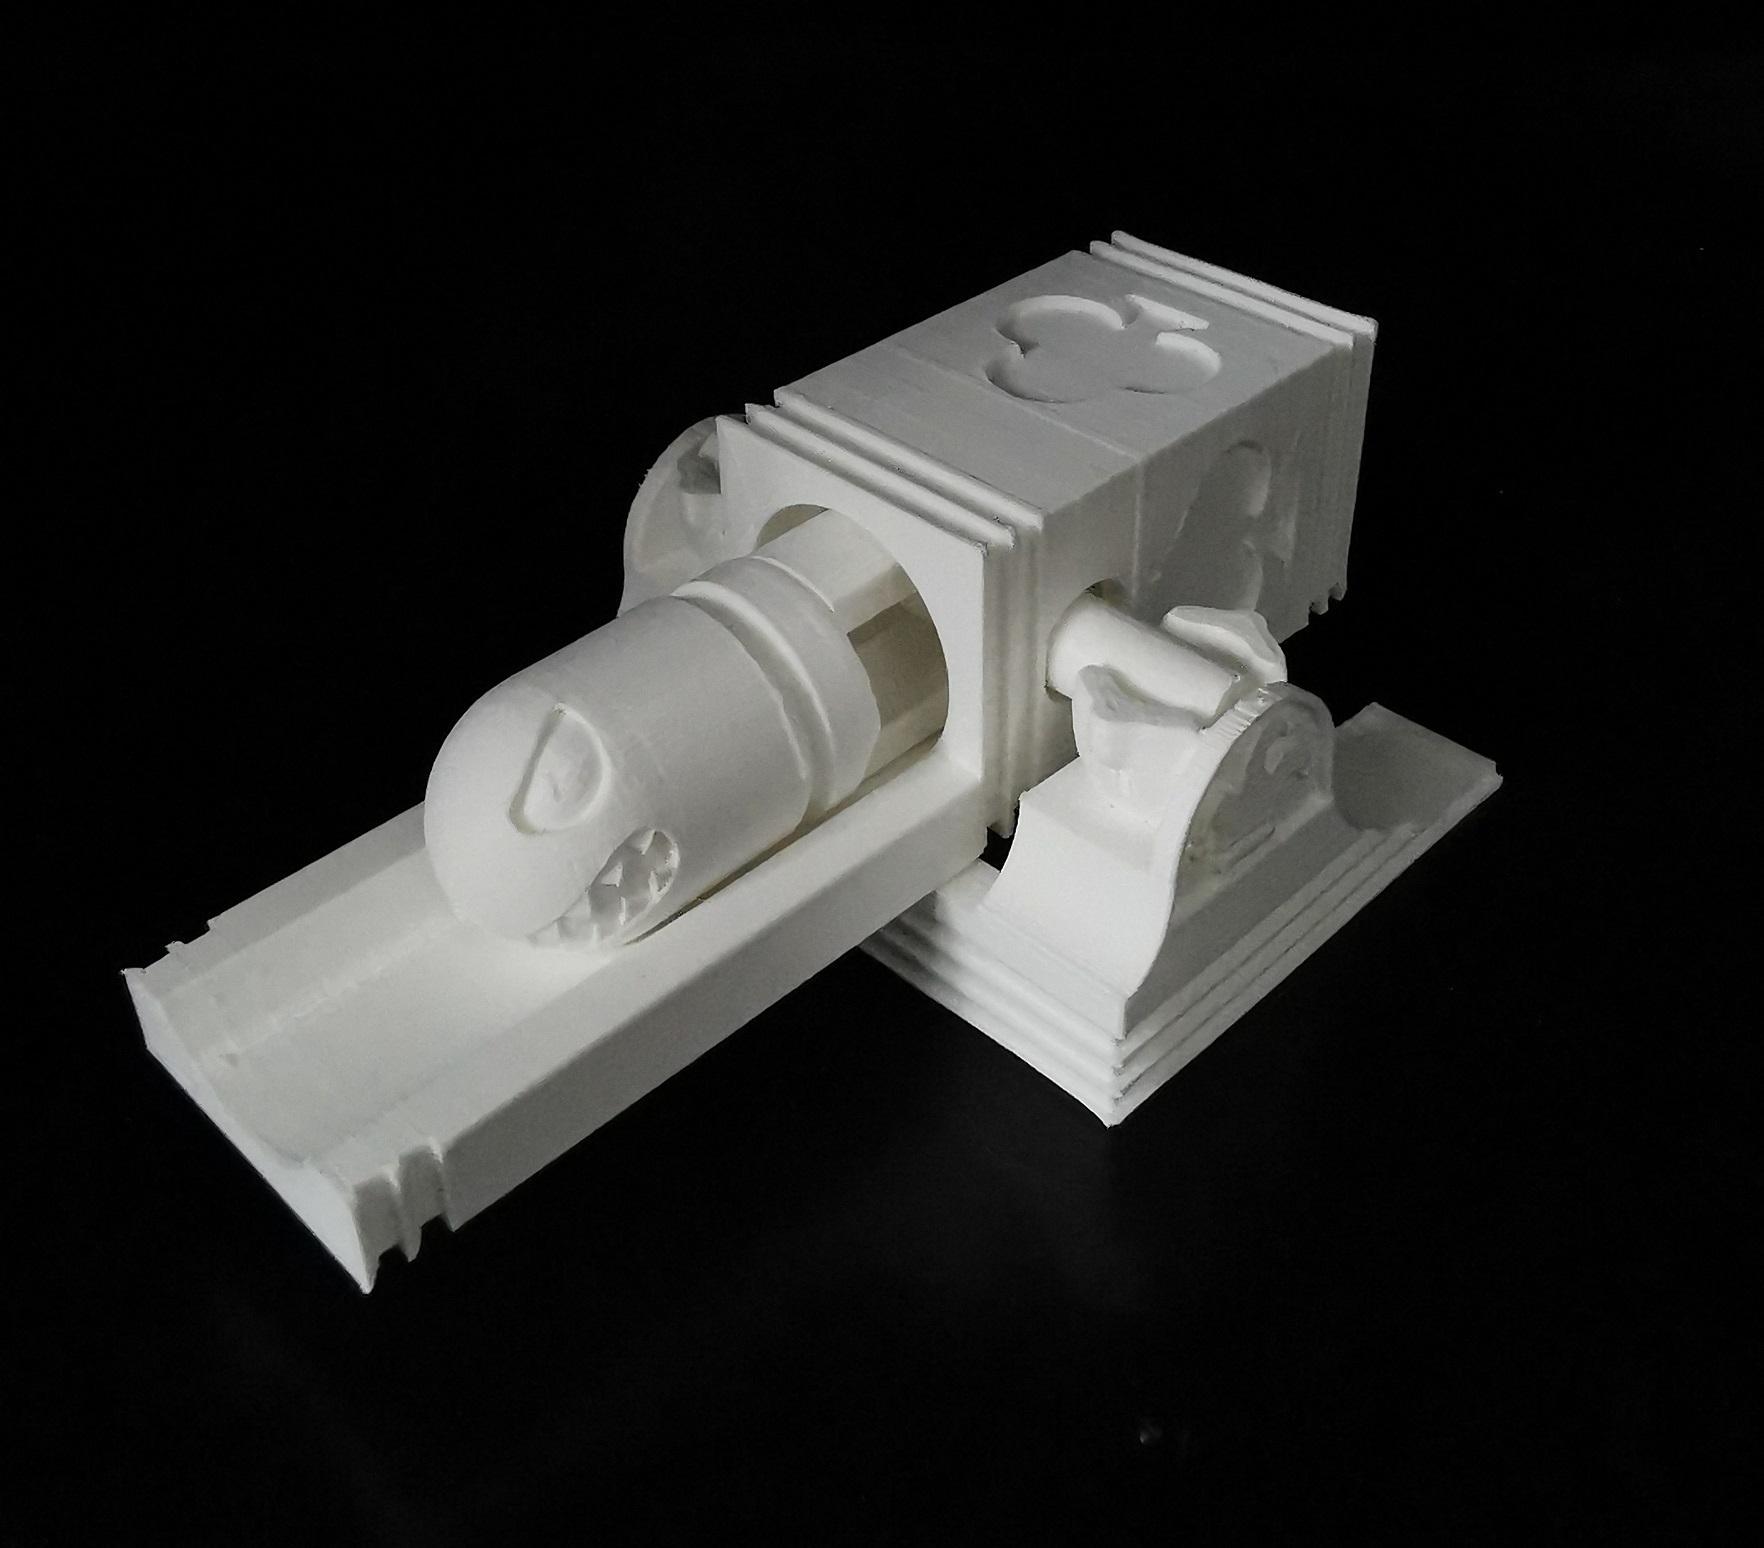 bullet_01.jpg Download STL file Bullet Bill launching platform • 3D printer model, eAgent